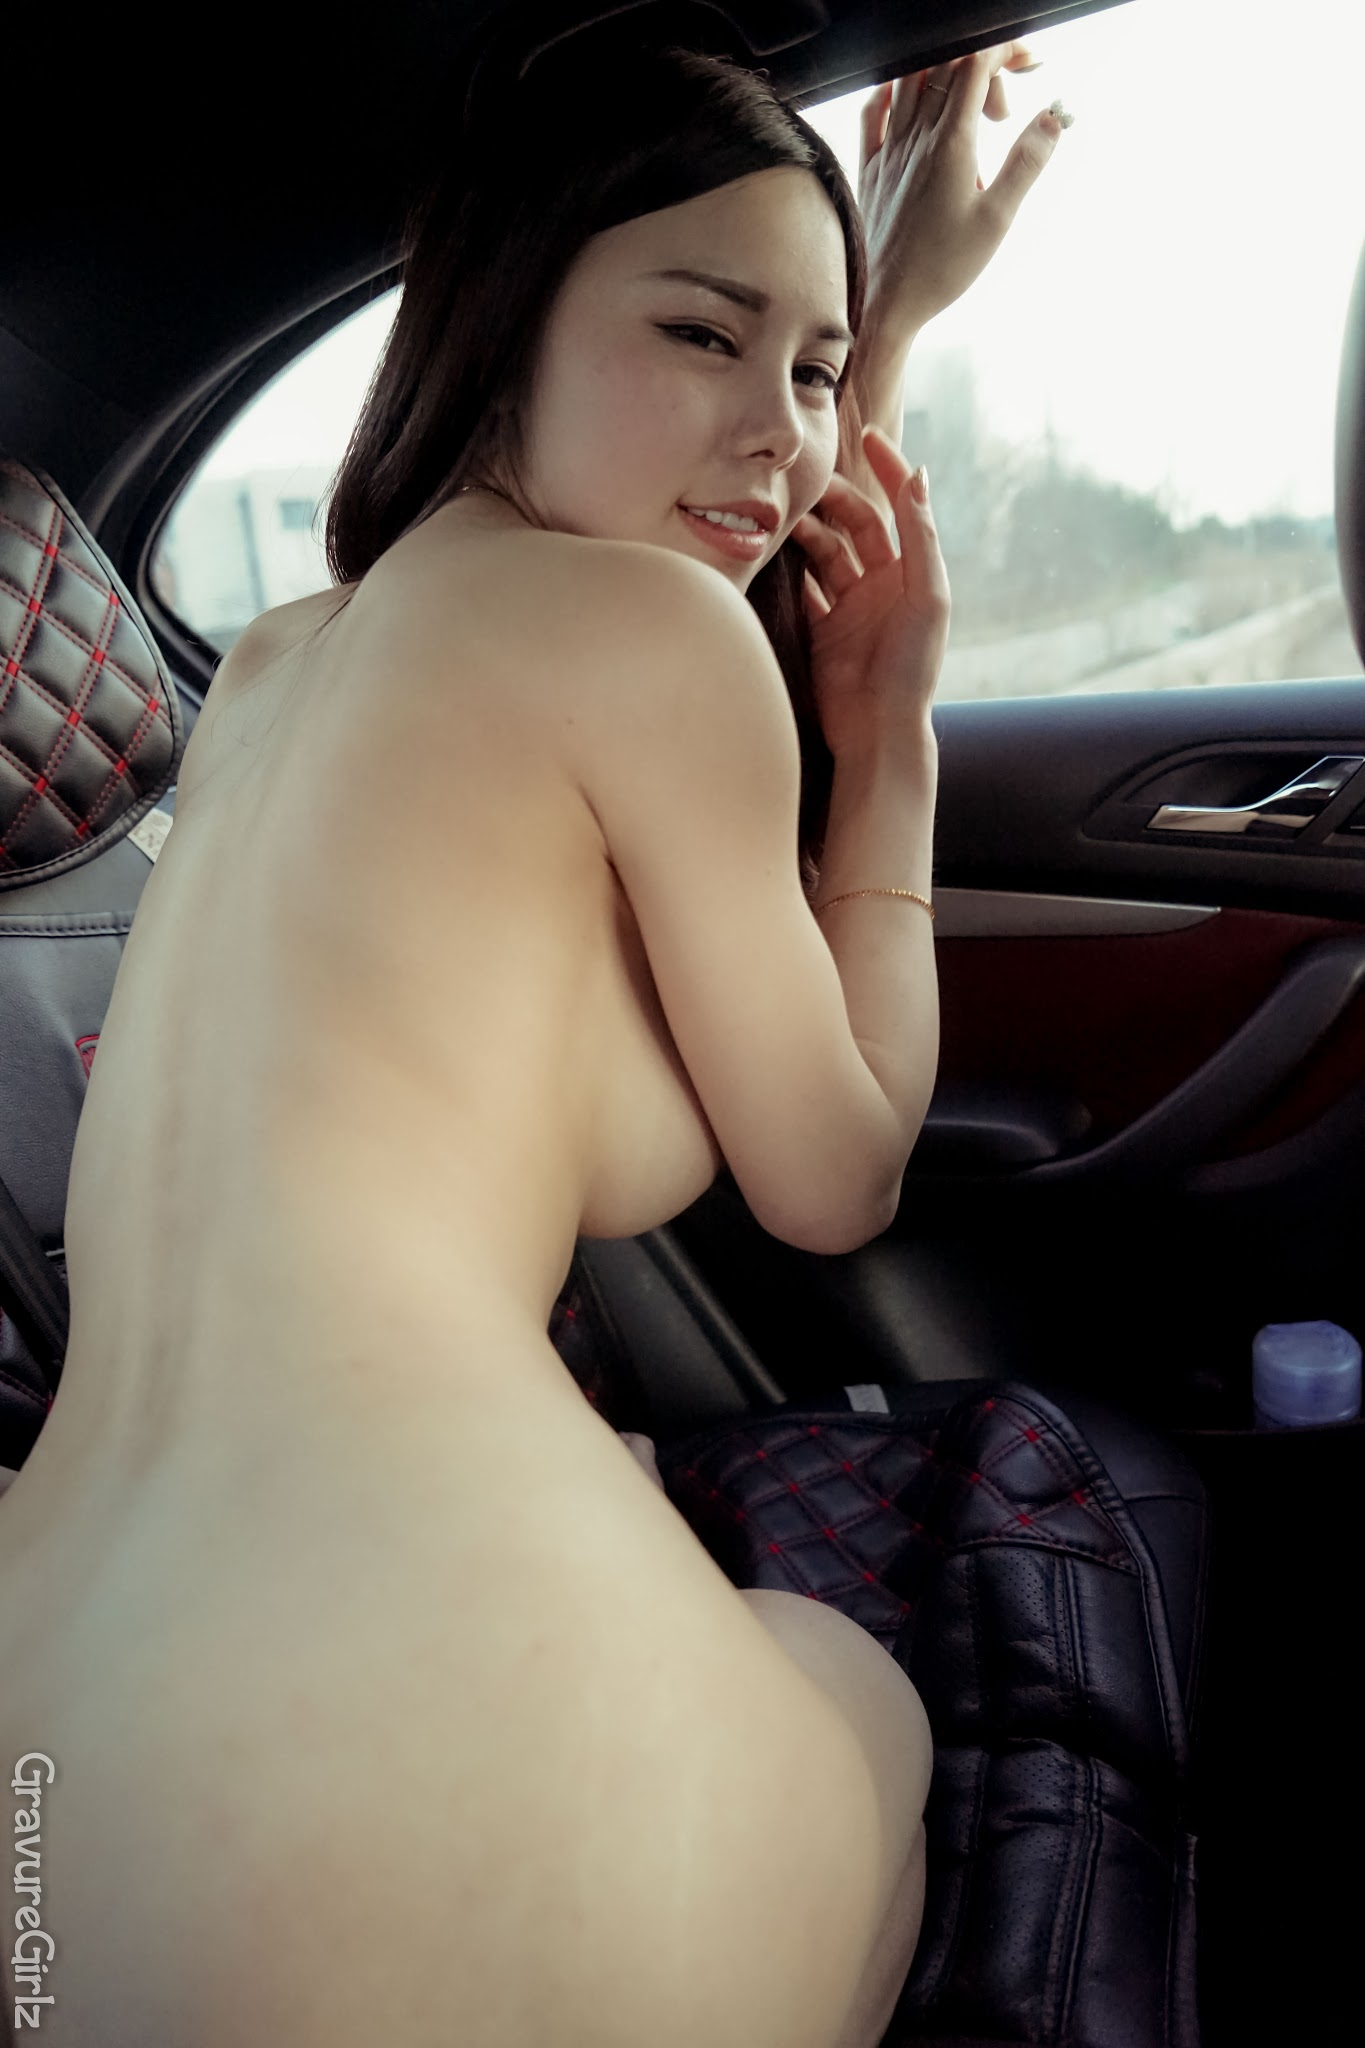 Shen Jiaxi  Nude Sexy Time Inside Car Original   - Photo Gallery 5-1042